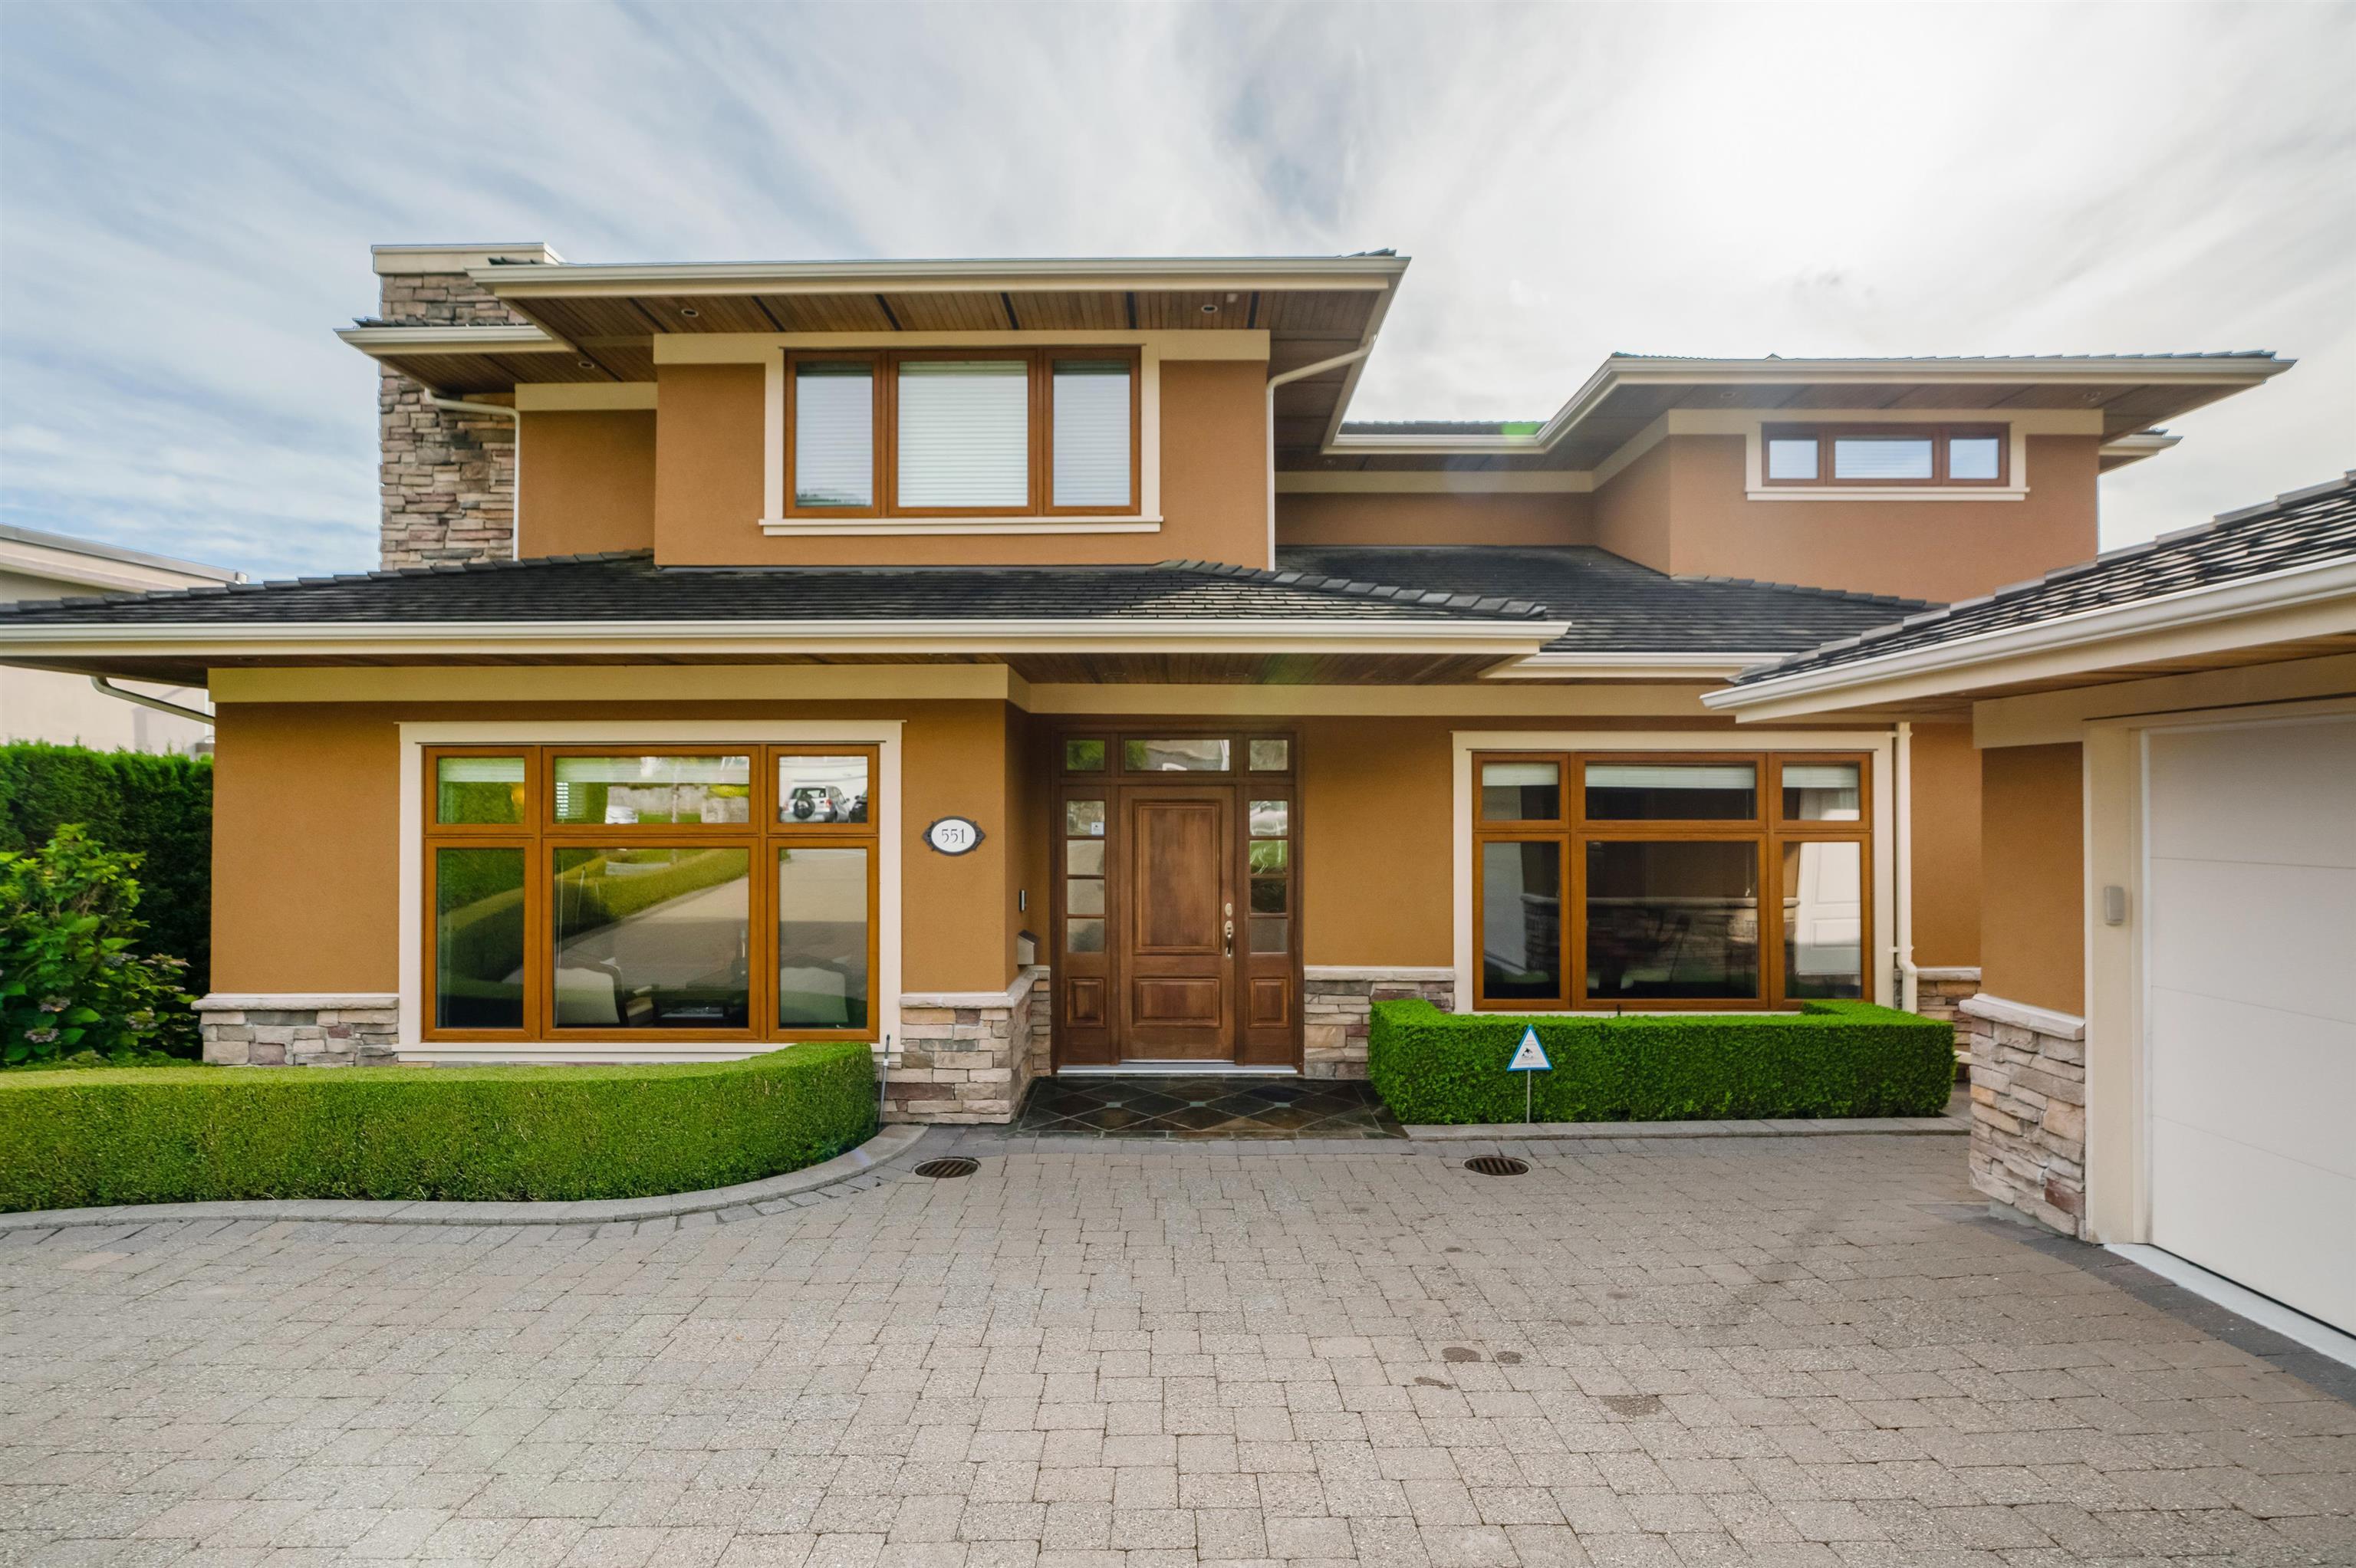 551 SAVILLE CRESCENT - Upper Delbrook House/Single Family for sale, 7 Bedrooms (R2621224) - #1